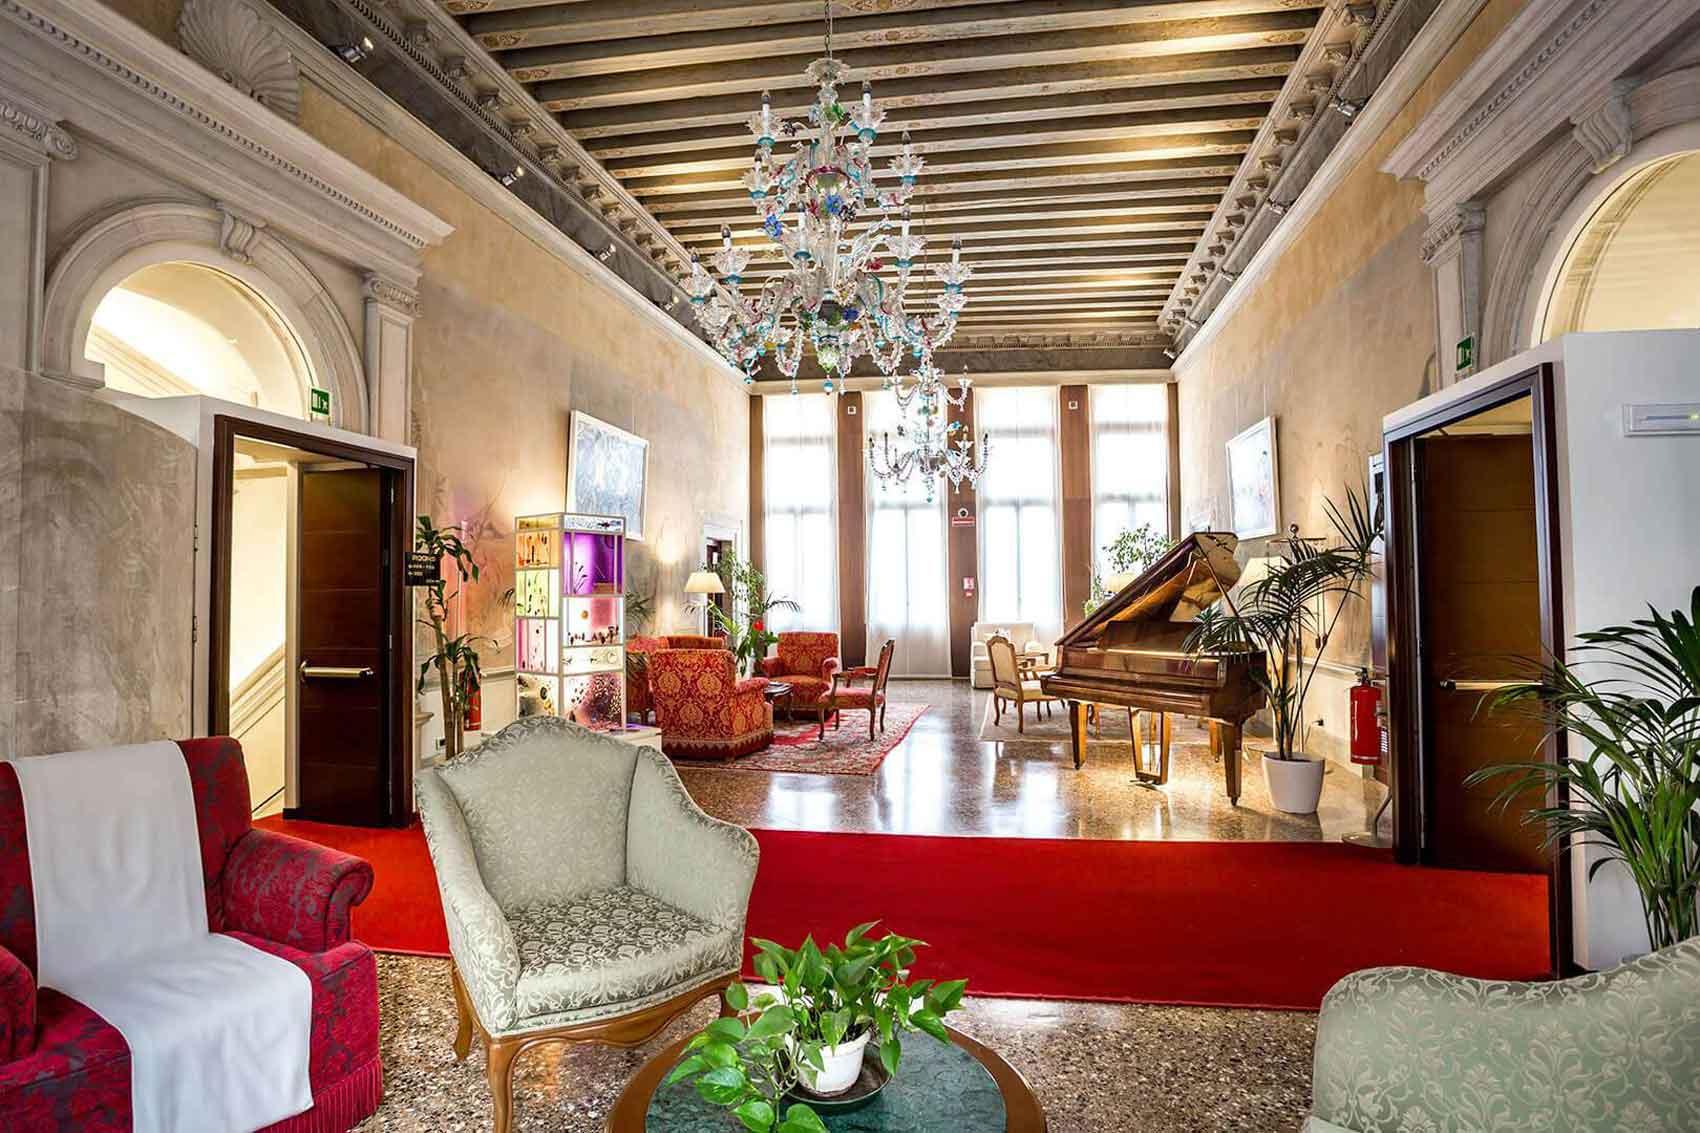 Ruzzini Palace Hotel 4 étoiles Venise (salon)